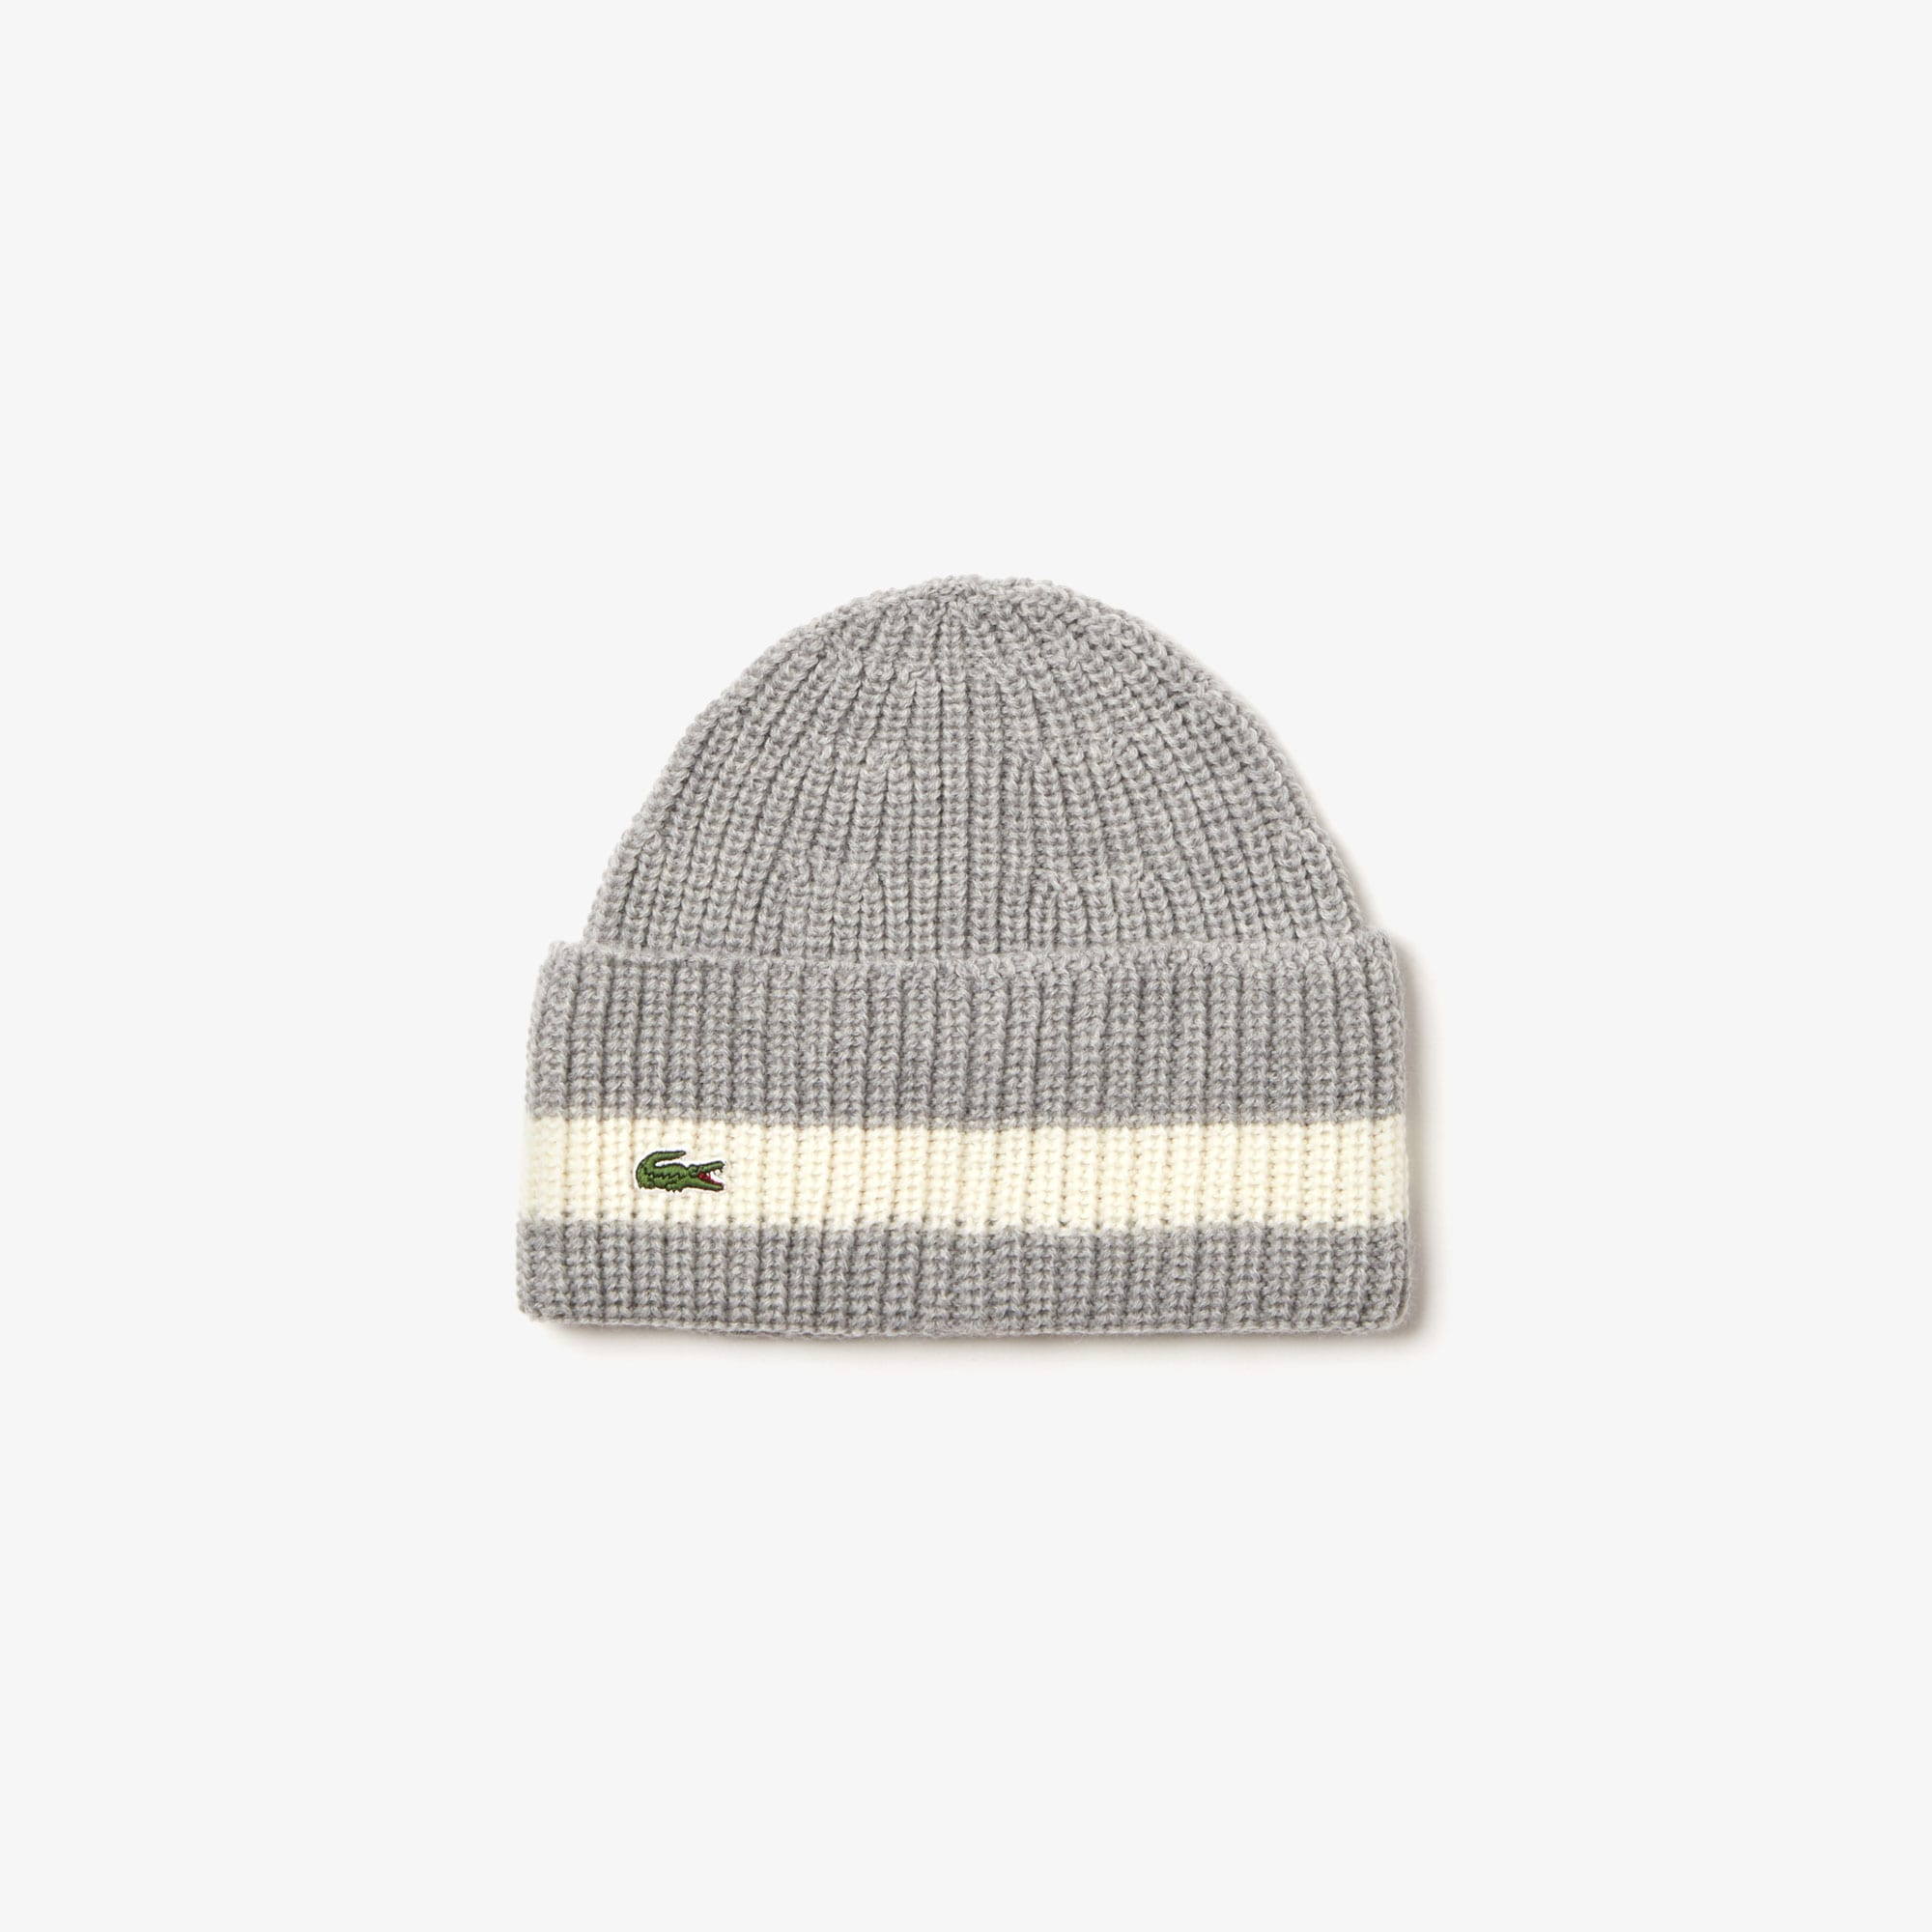 89da43091 Caps & Hats | Men's Accessories | LACOSTE